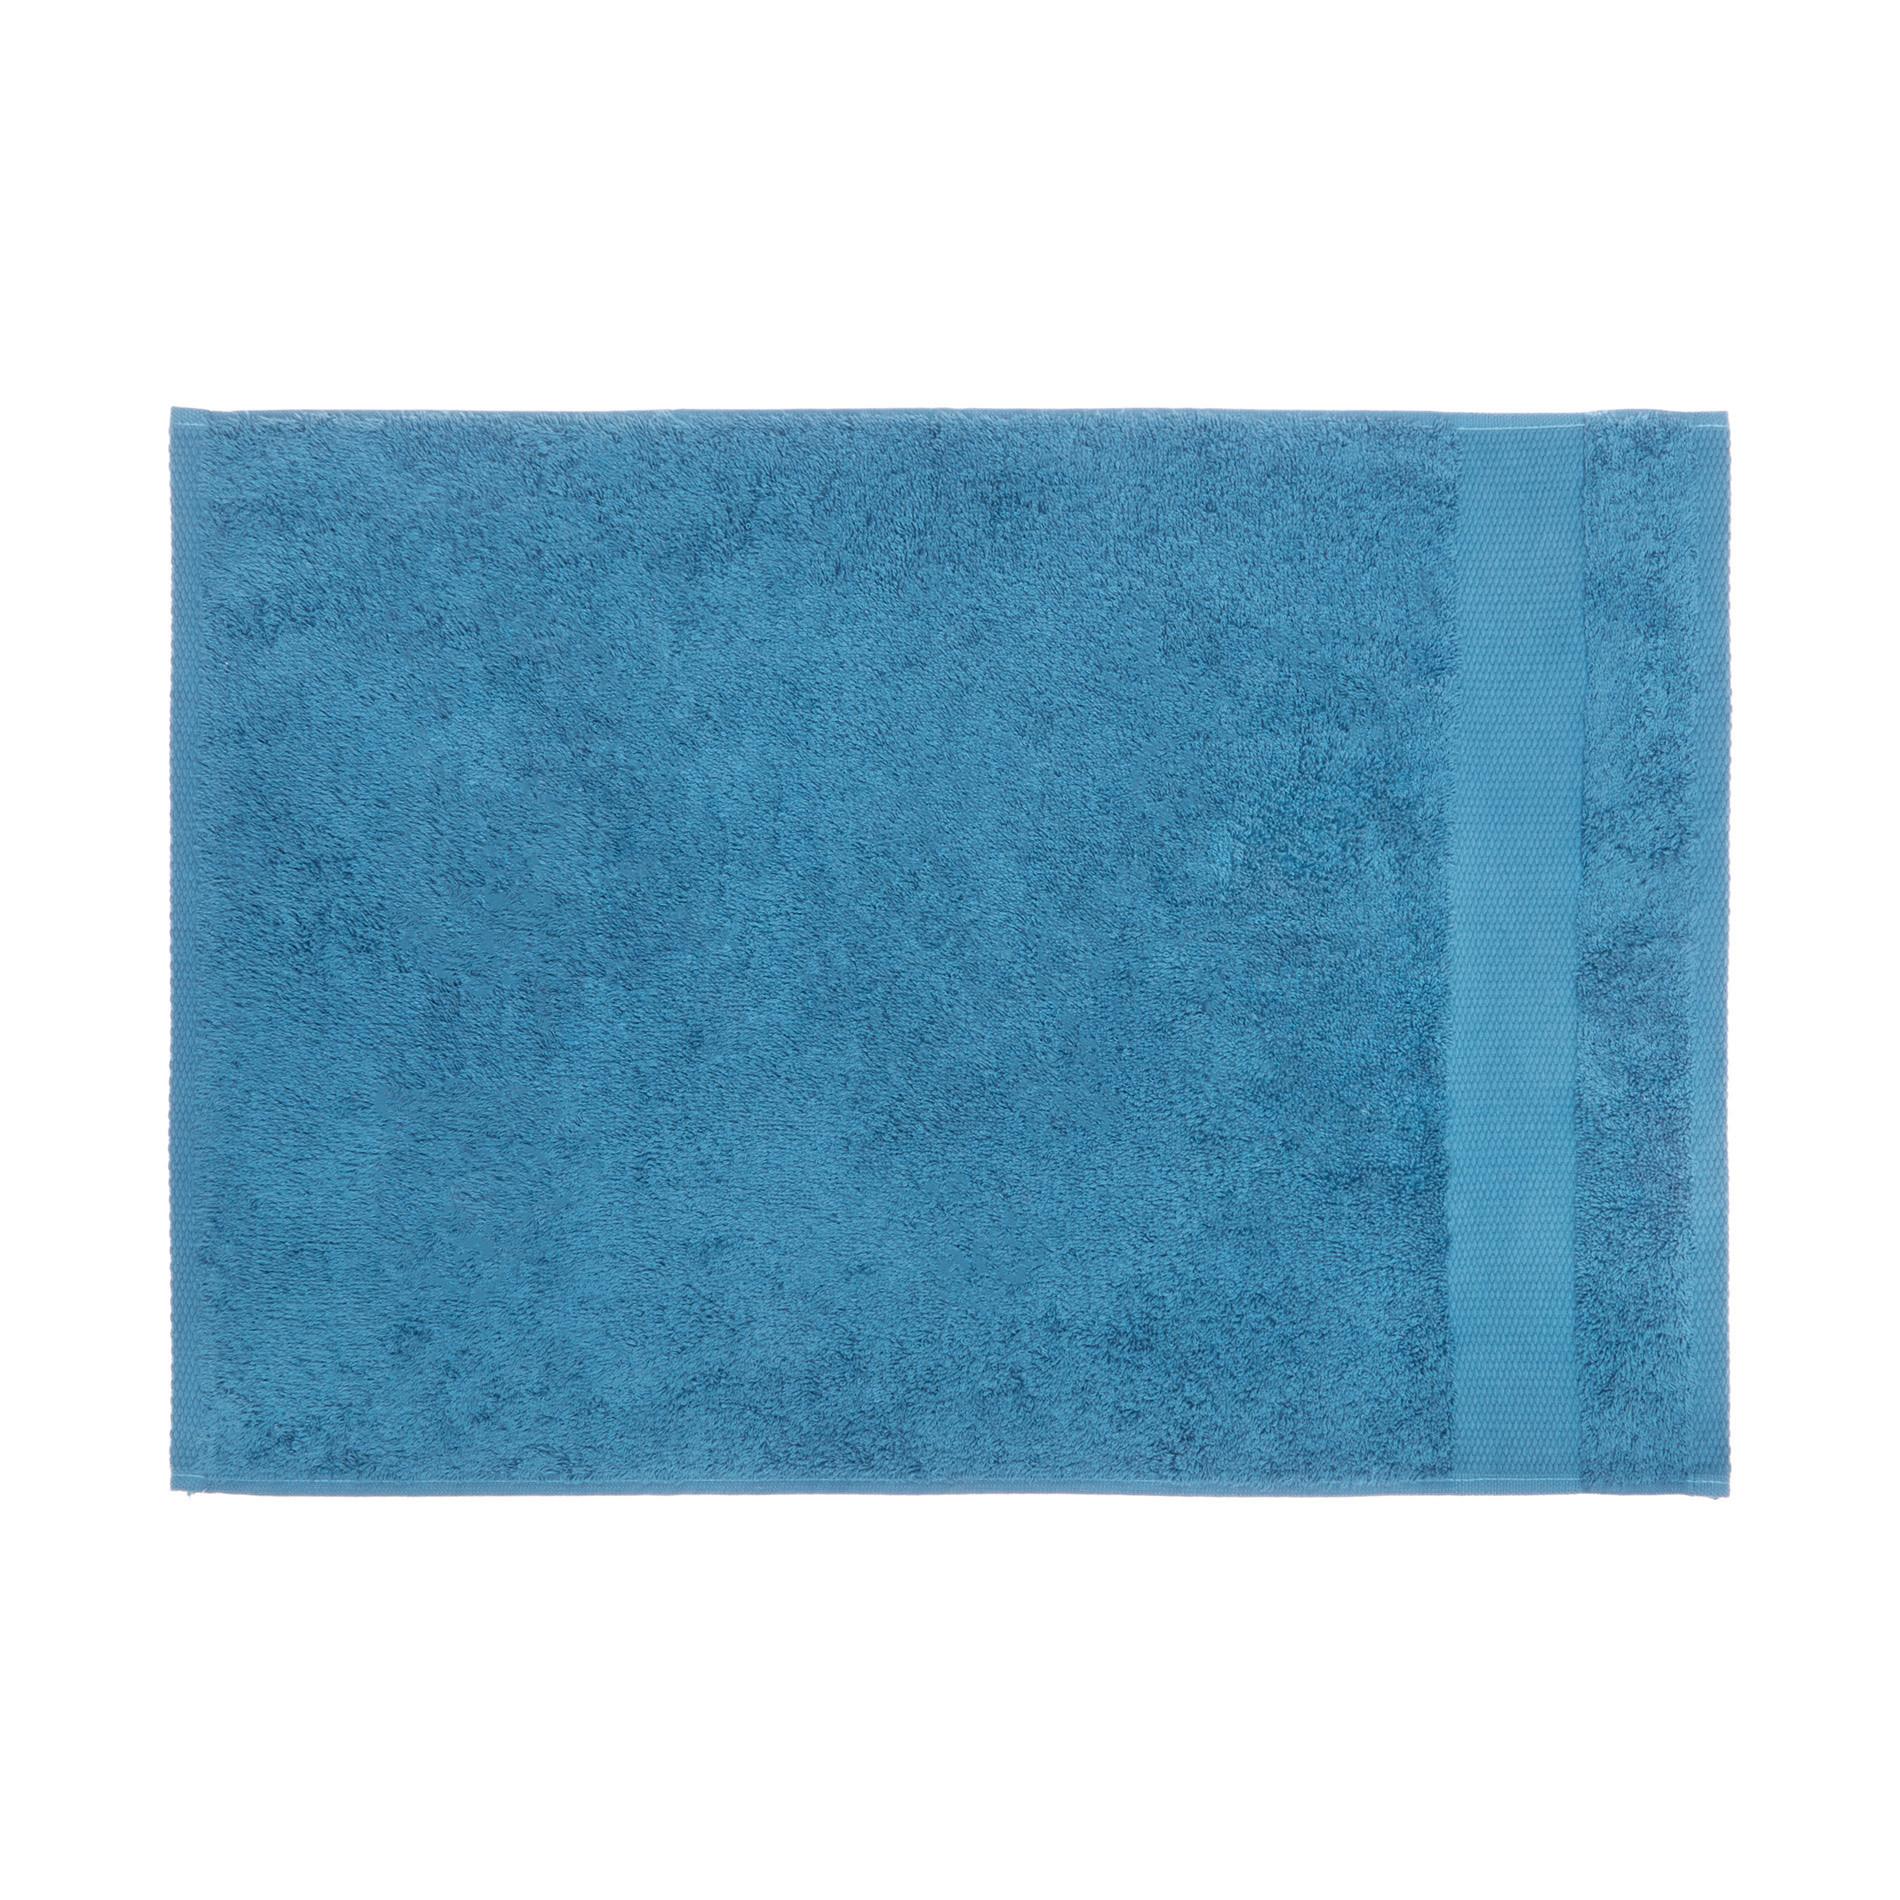 Asciugamano spugna di puro cotone Zefiro, Petrolio, large image number 2